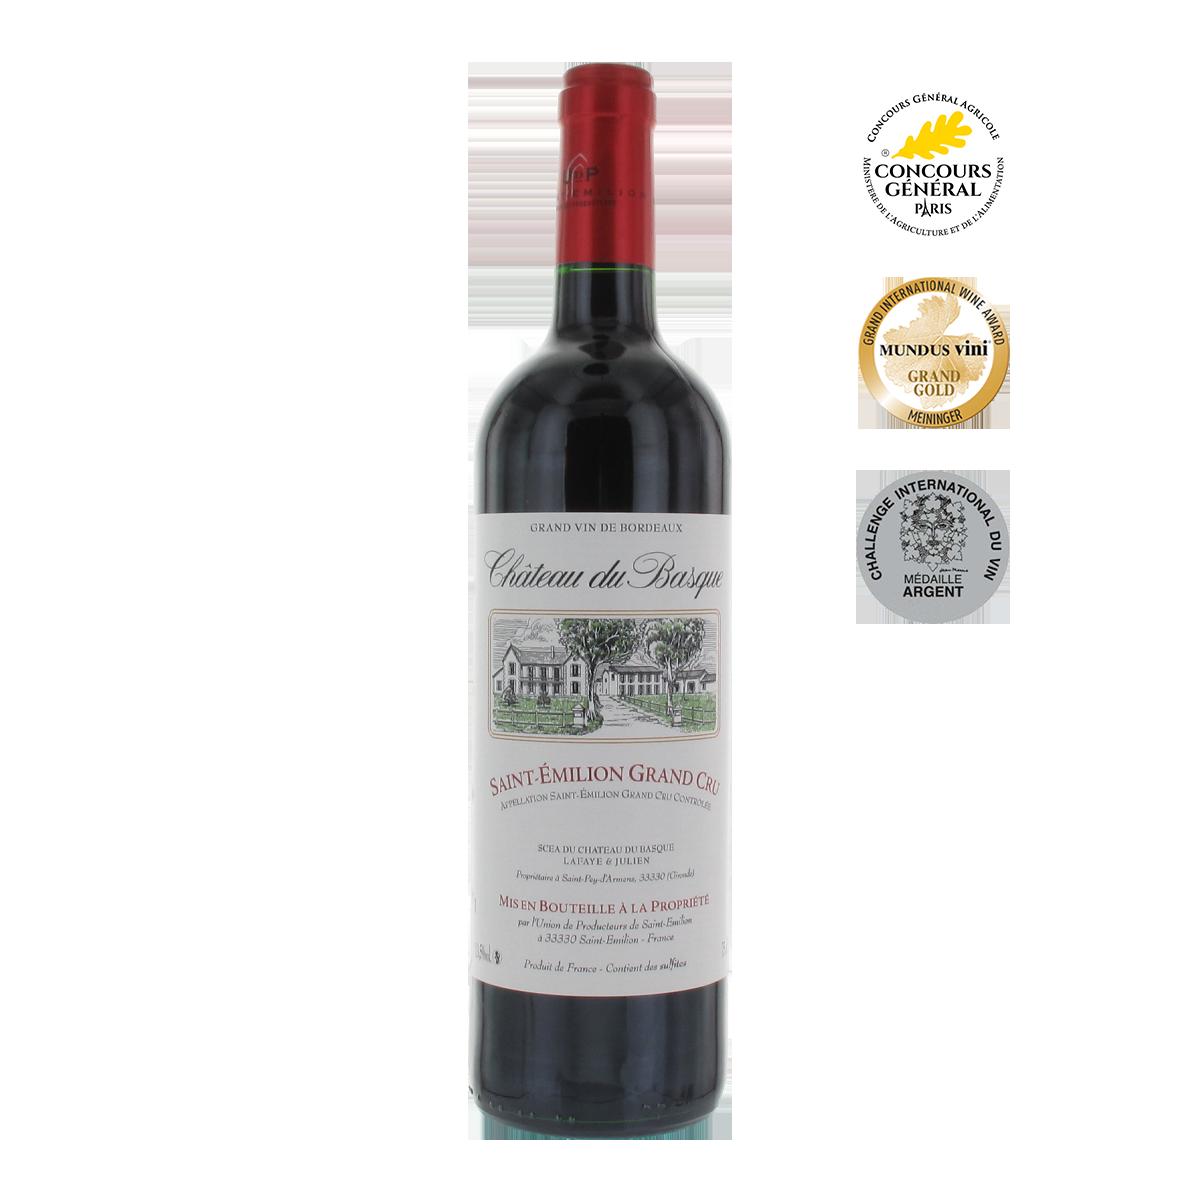 FRU1004-14 巴斯克莊園特級聖愛美濃紅酒 Château du Basque Saint-Émilion Grand Cru A.O.C.